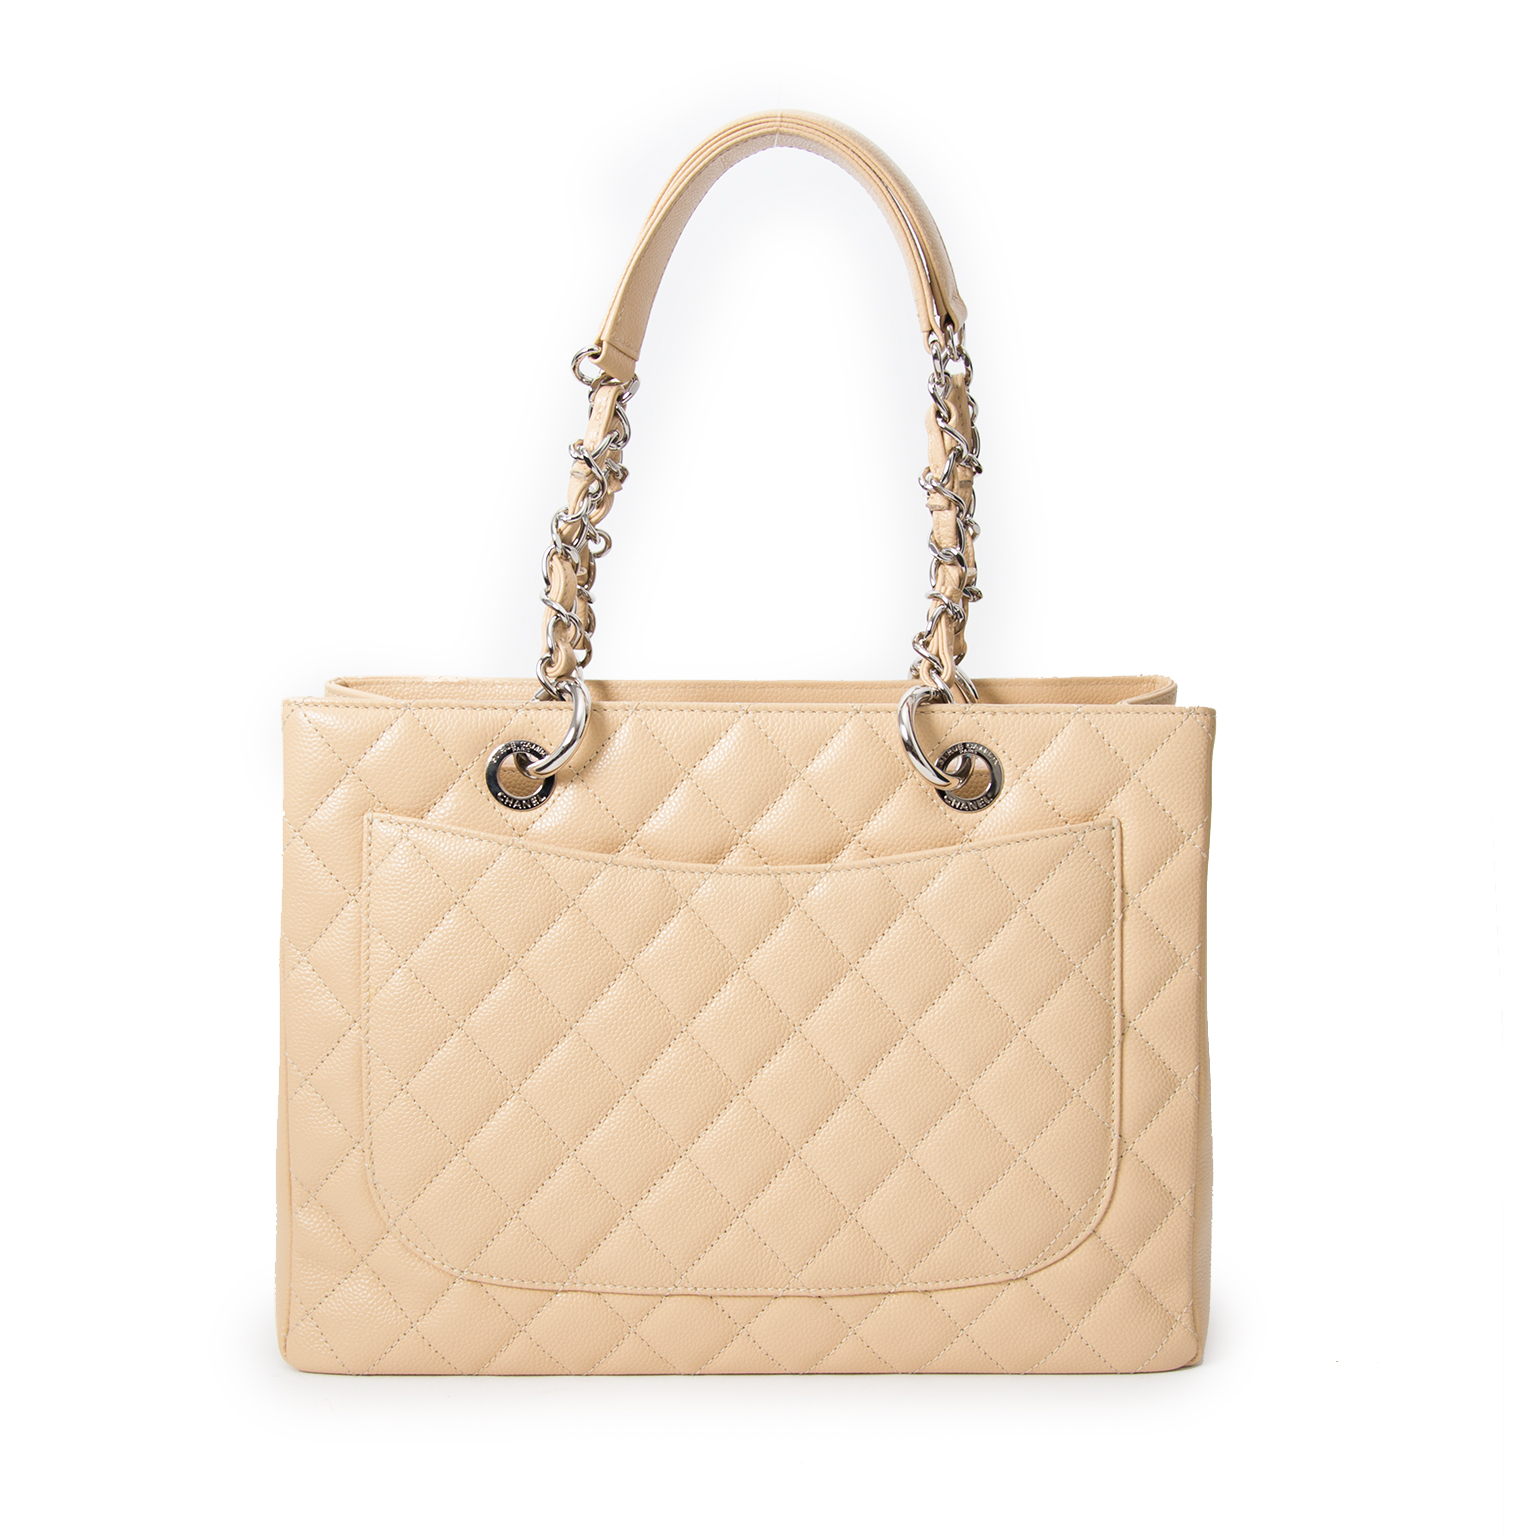 20afac7bd982 ... koop veilig online aan de beste prijs As New Poudre Chanel Grand  Shopping Tote